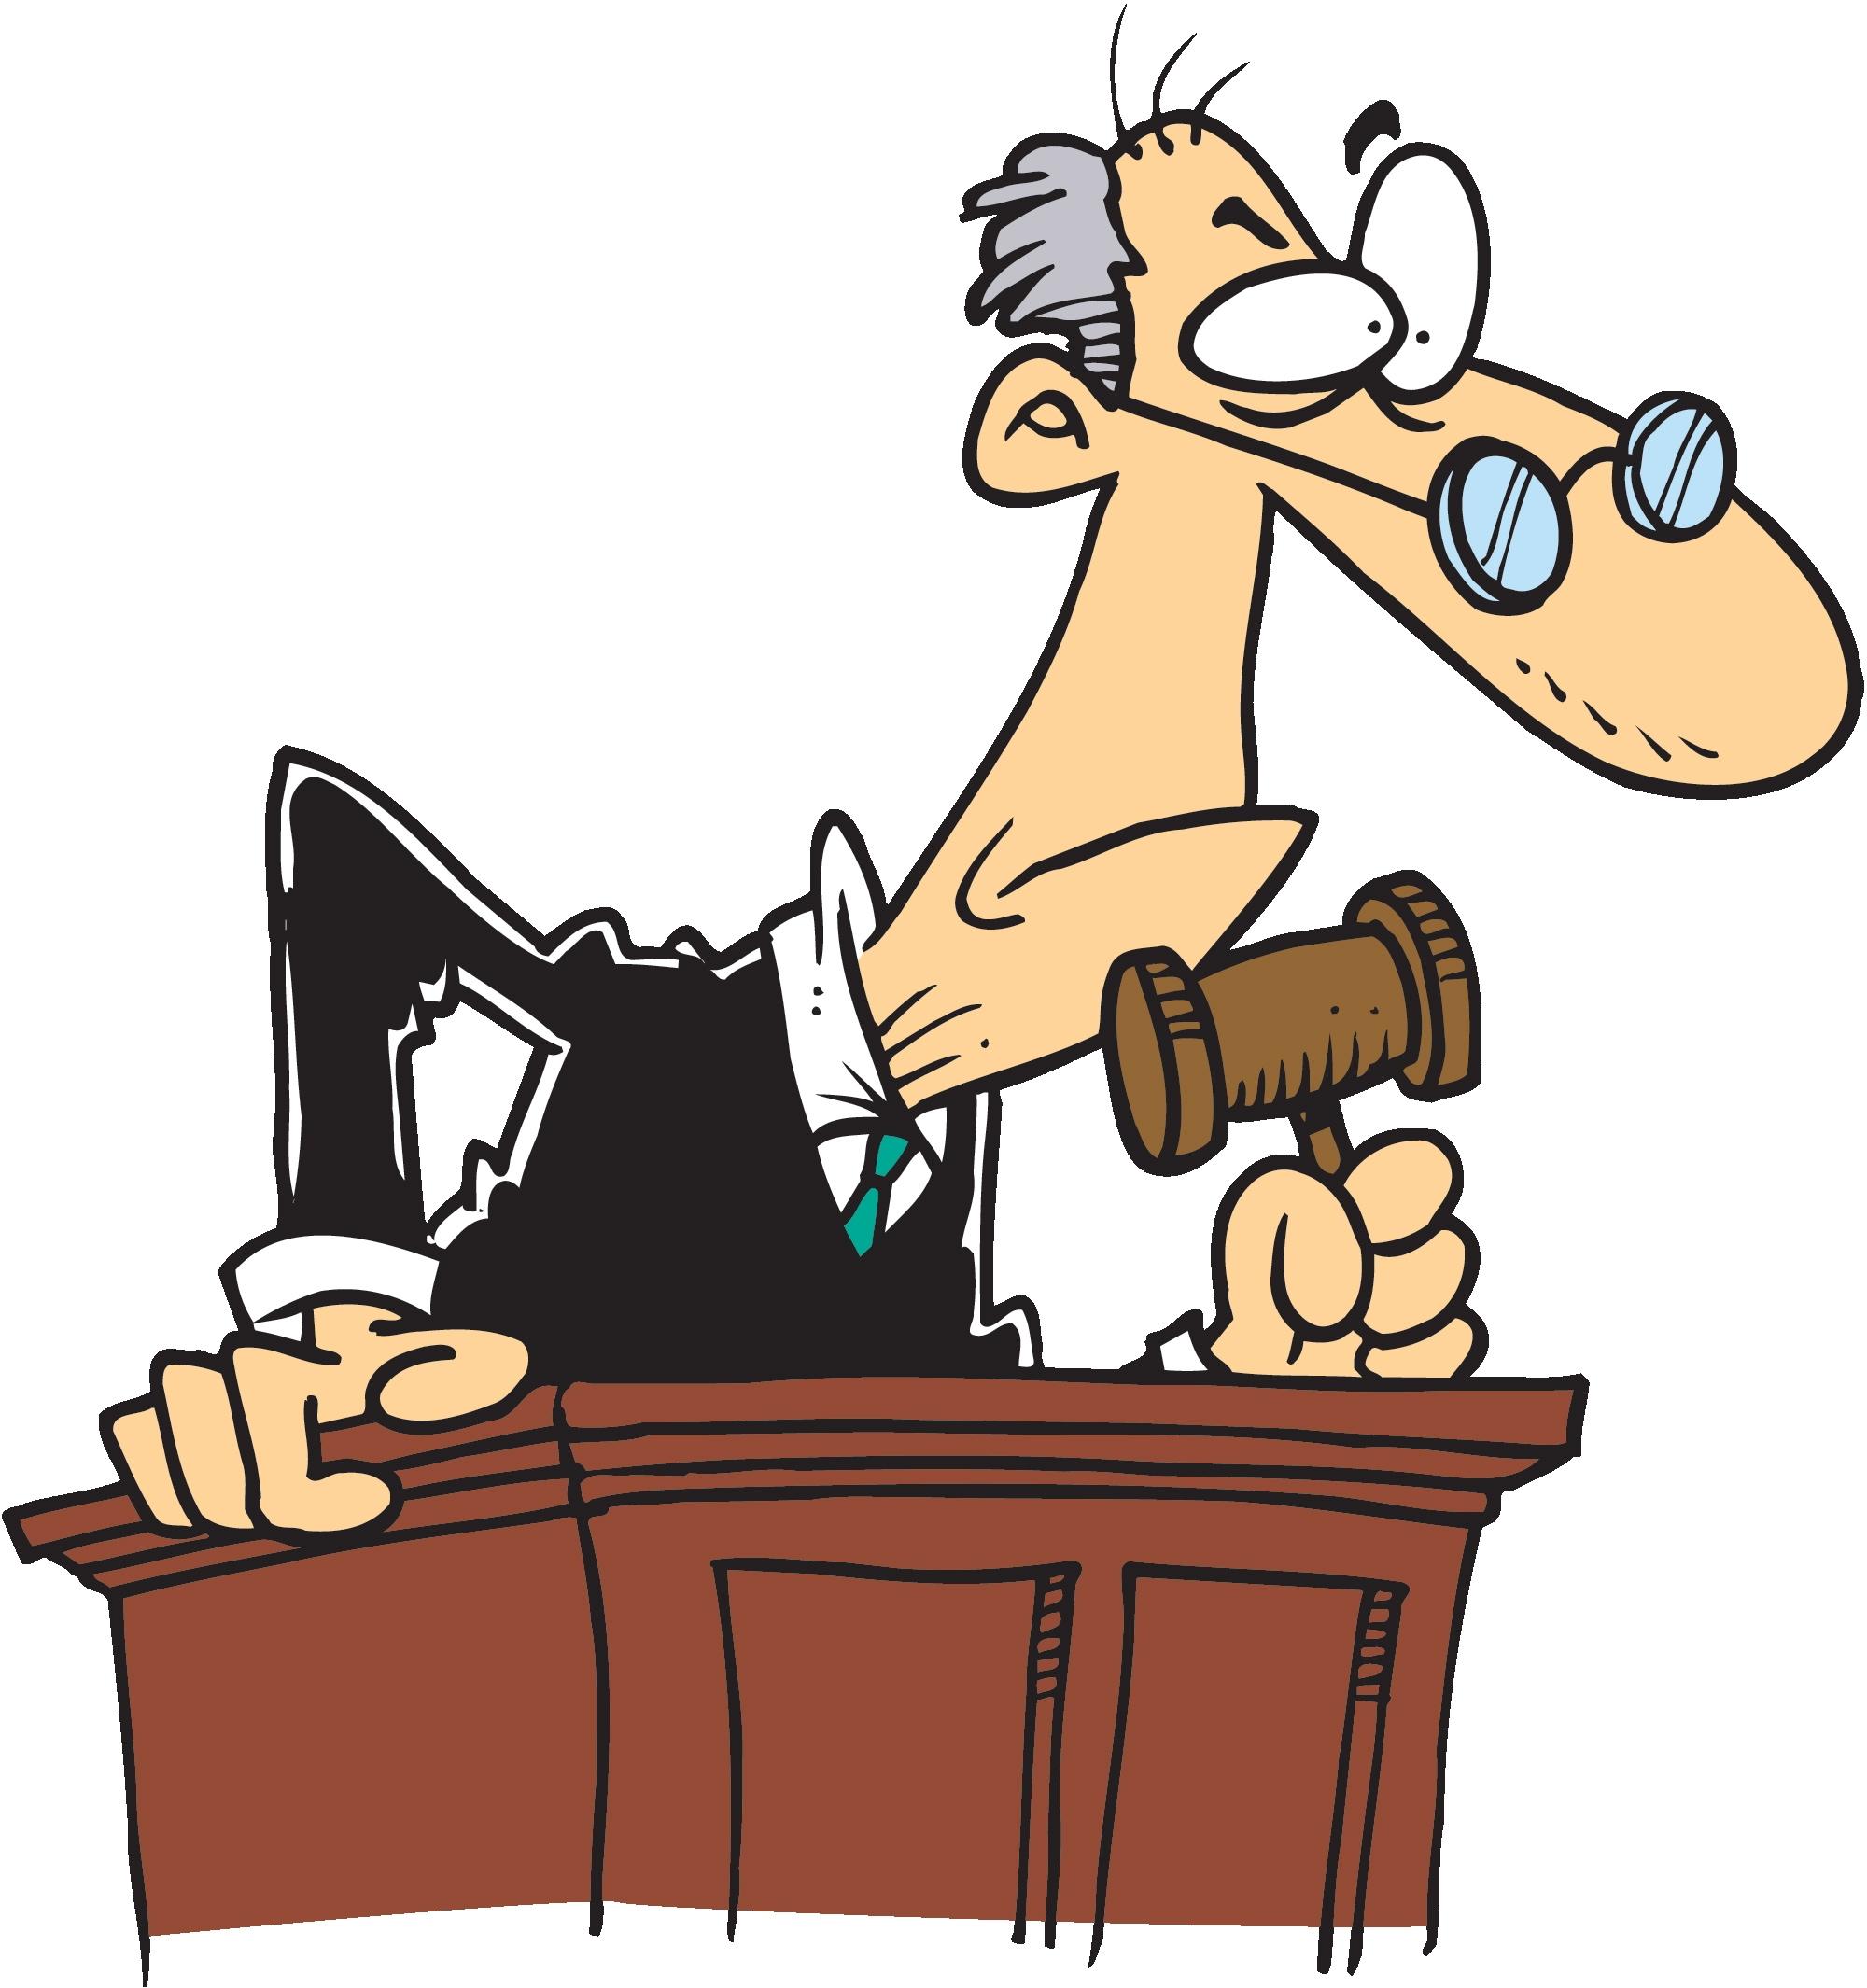 Court clipart Elegant Judge Clipart Free Download Clip Art Free Clip.